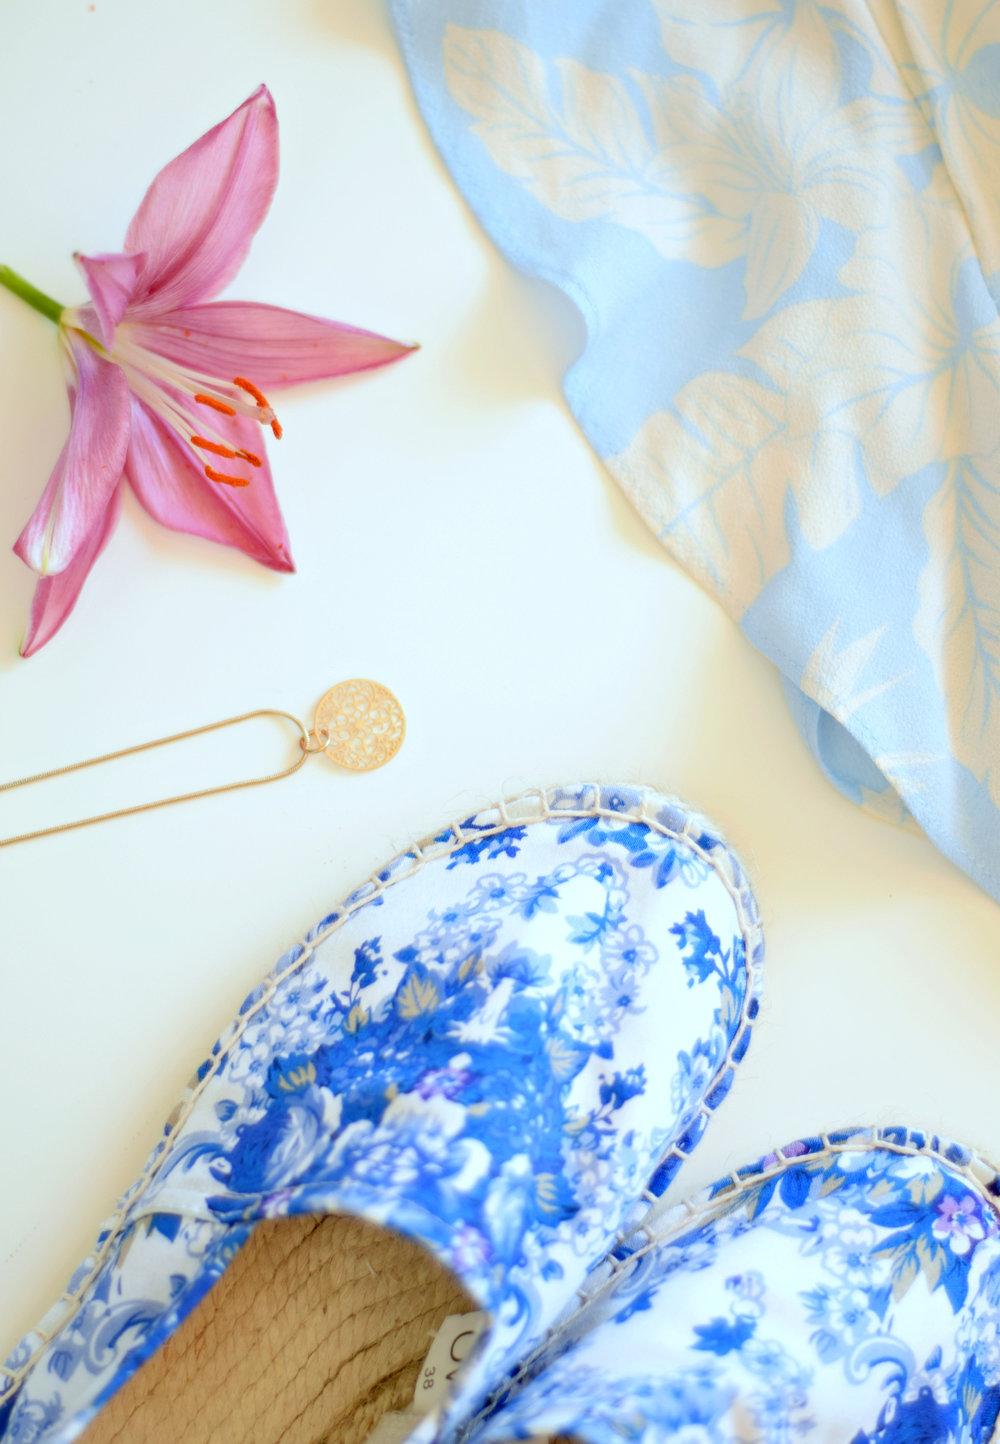 H&M romper // gold Accessorize necklace // Blue OVS espadrilles